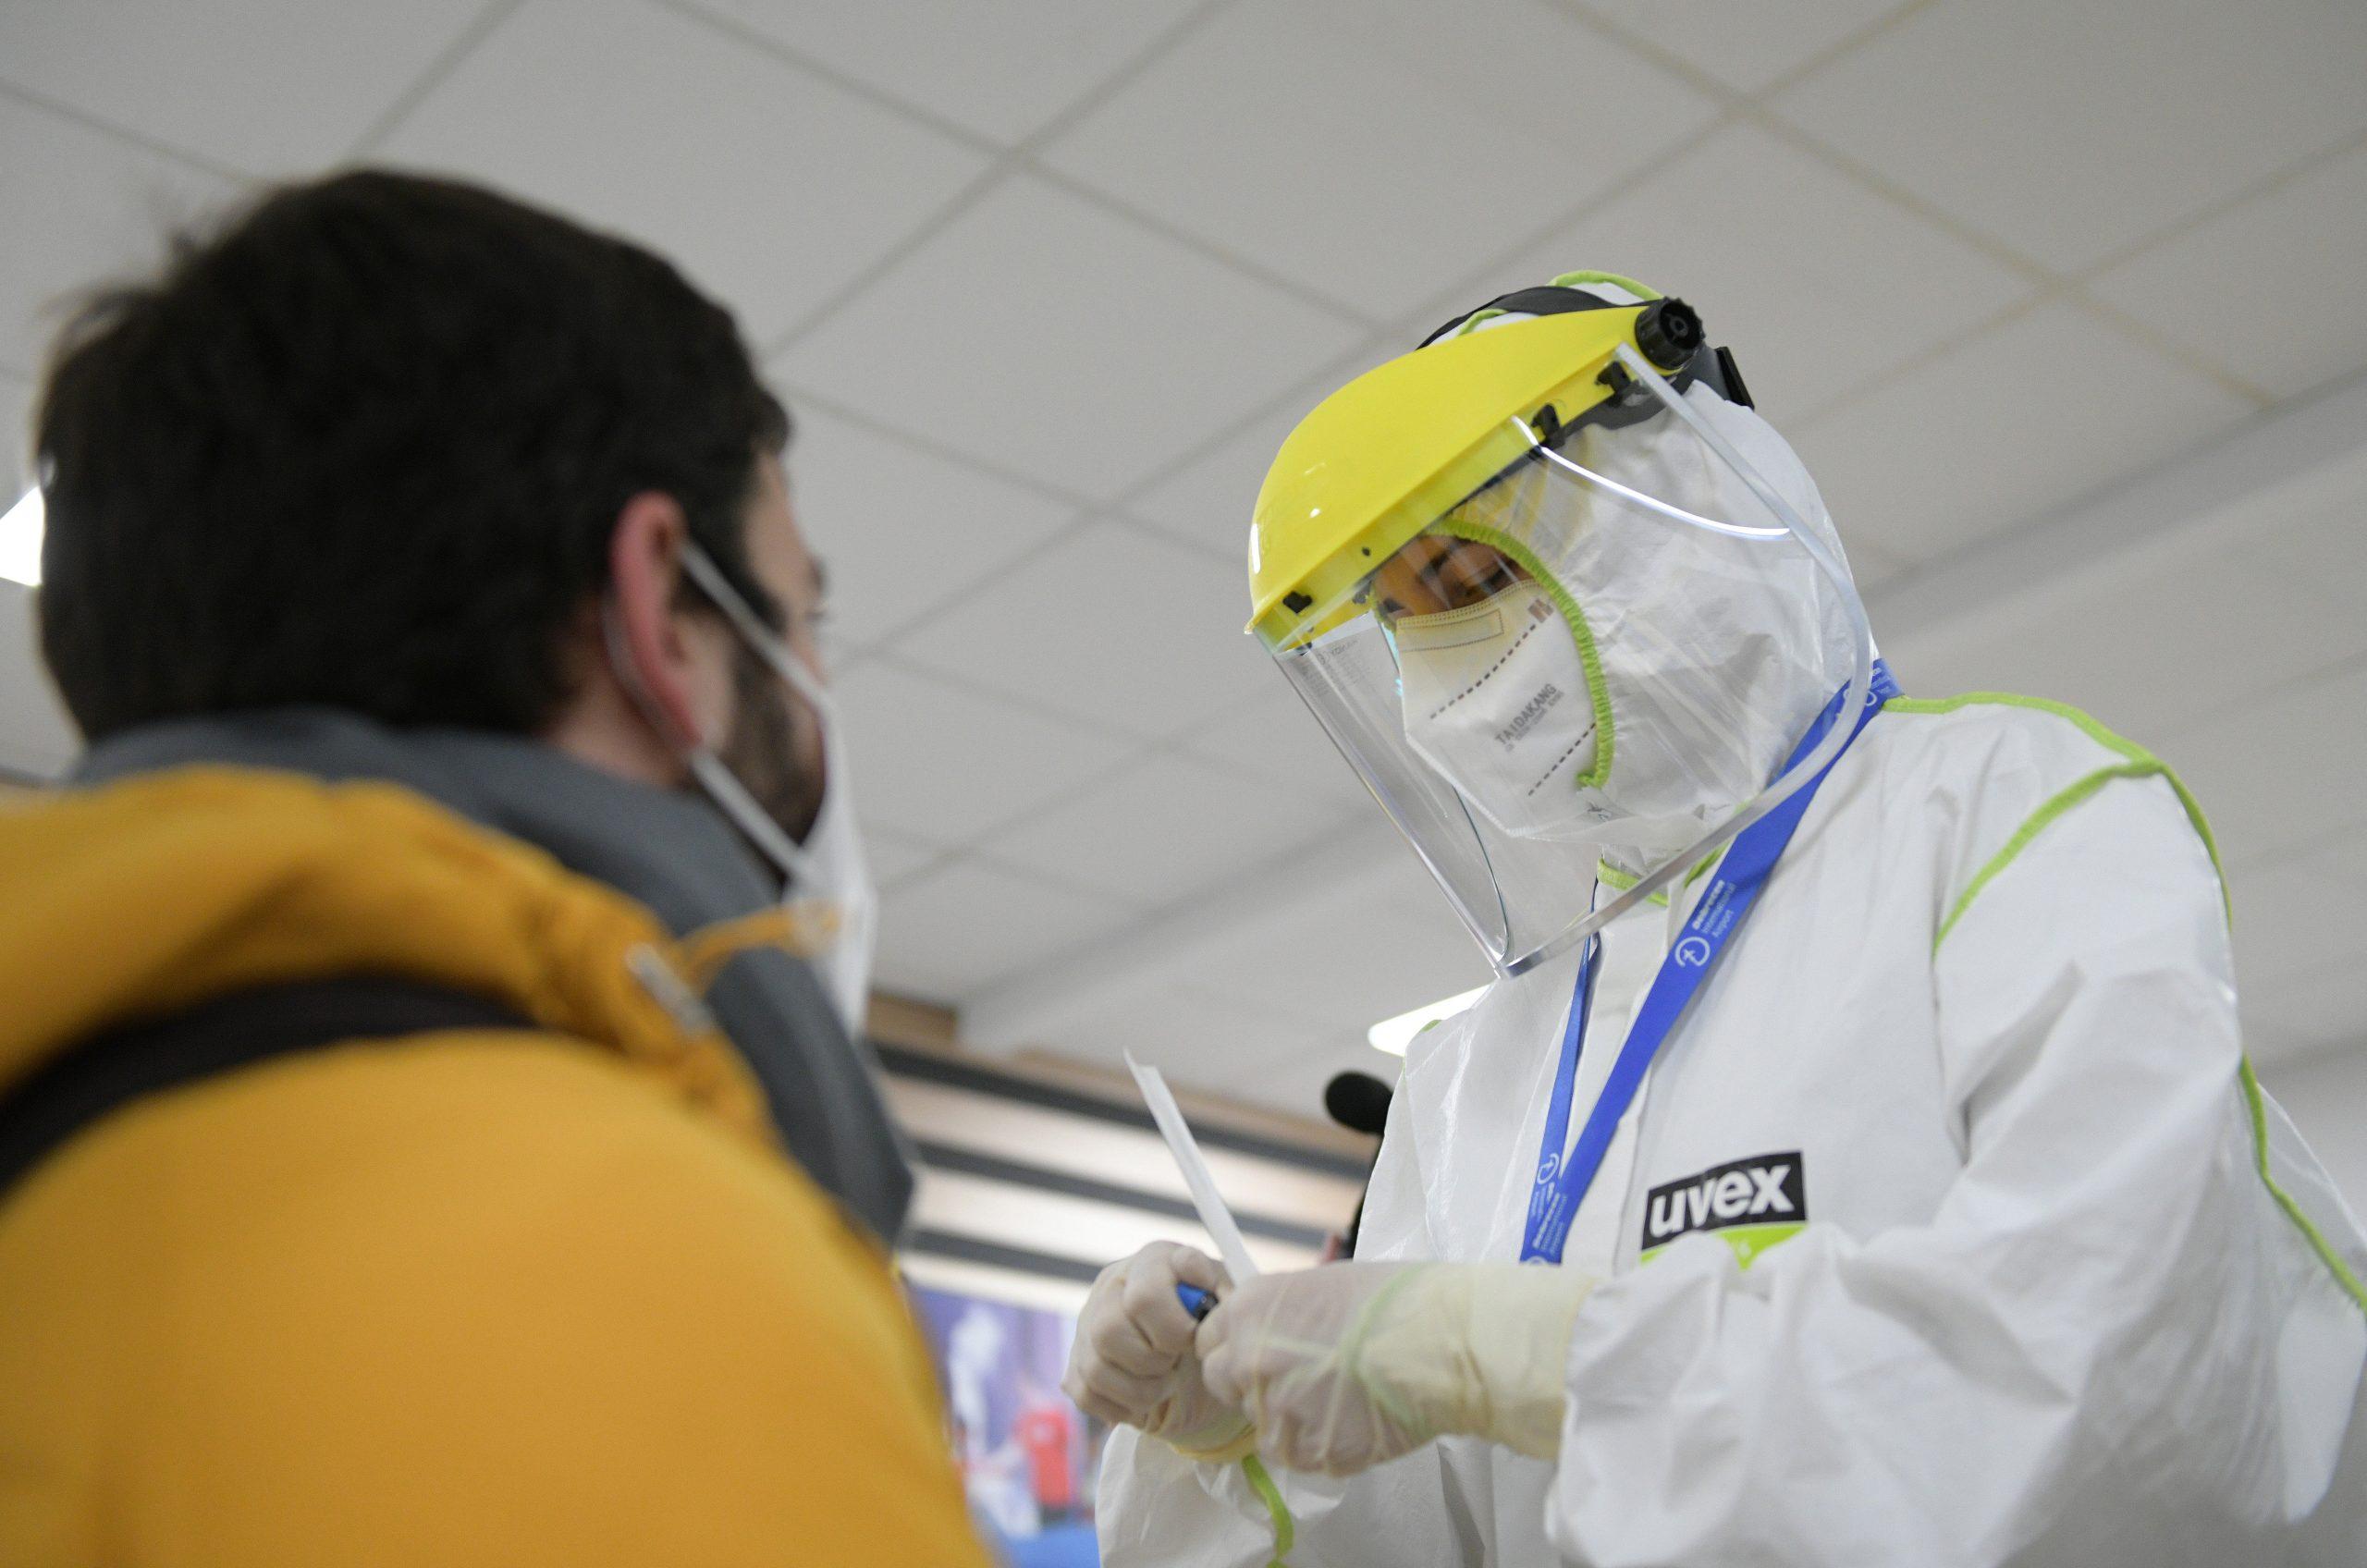 Coronavirus: Hungary Authorises Use of Lilly's Covid-19 Antibody Drug